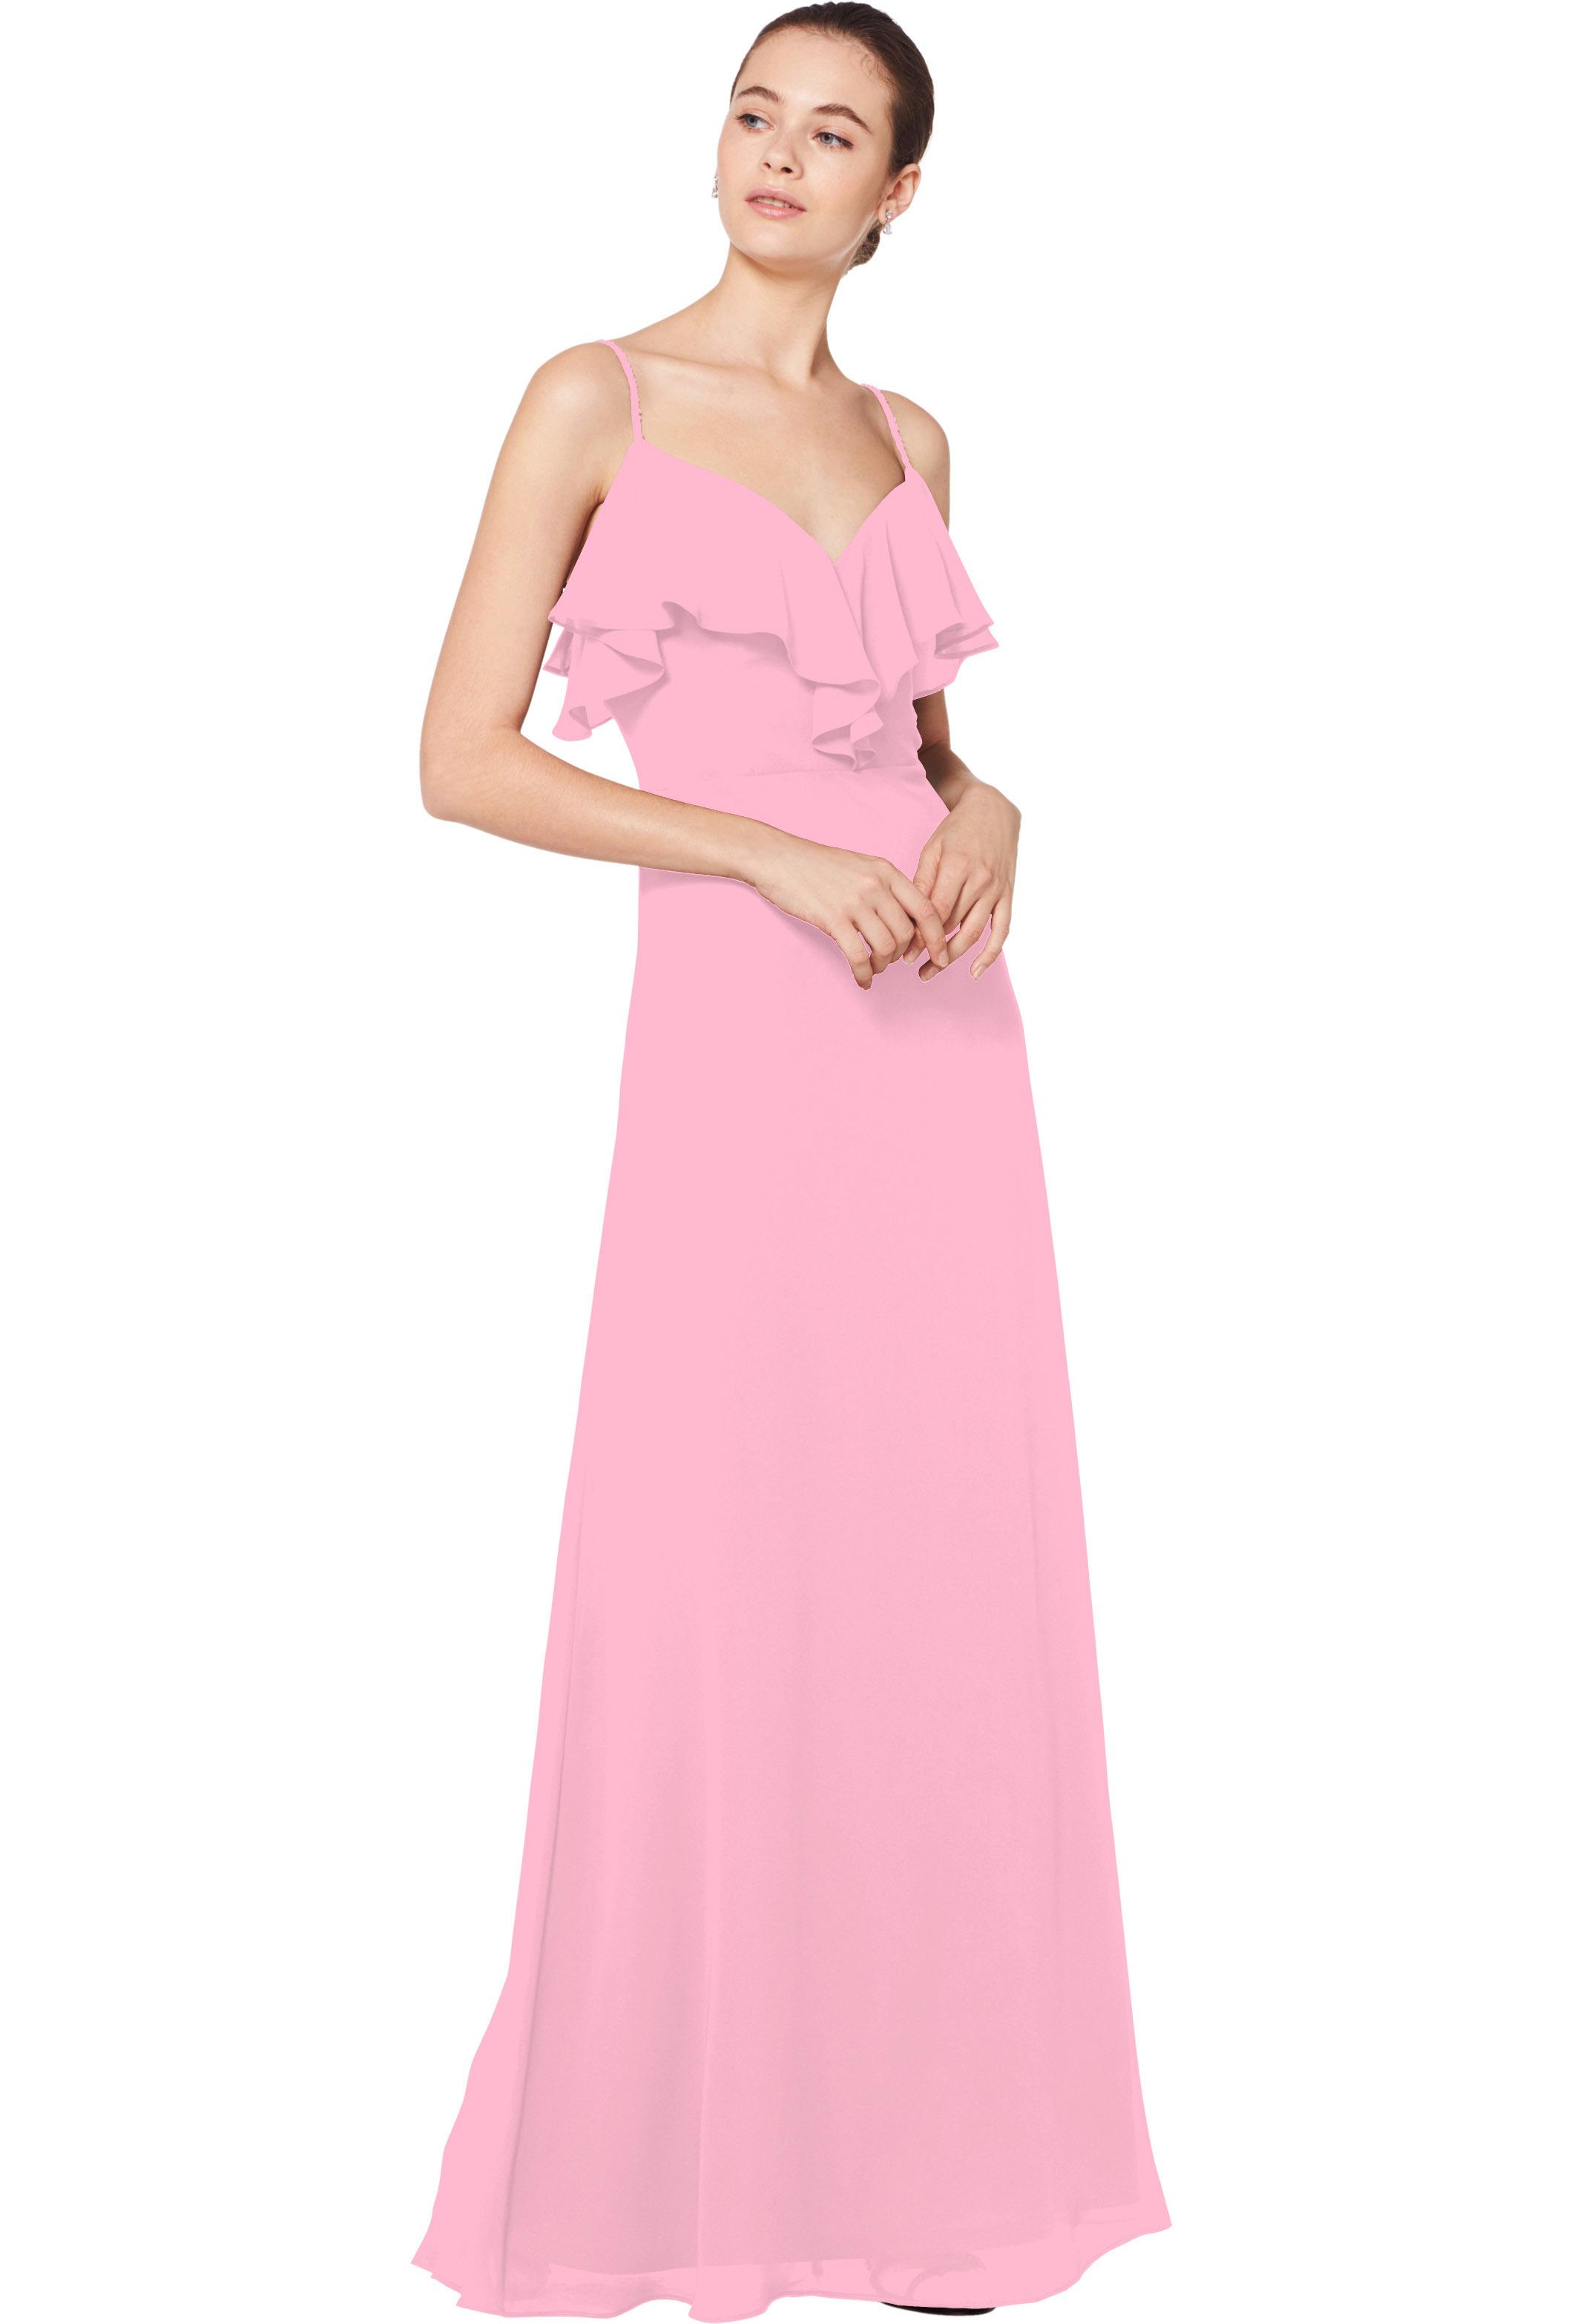 Bill Levkoff ROSEPETAL Chiffon Sweetheart A-line gown, $180.00 Front